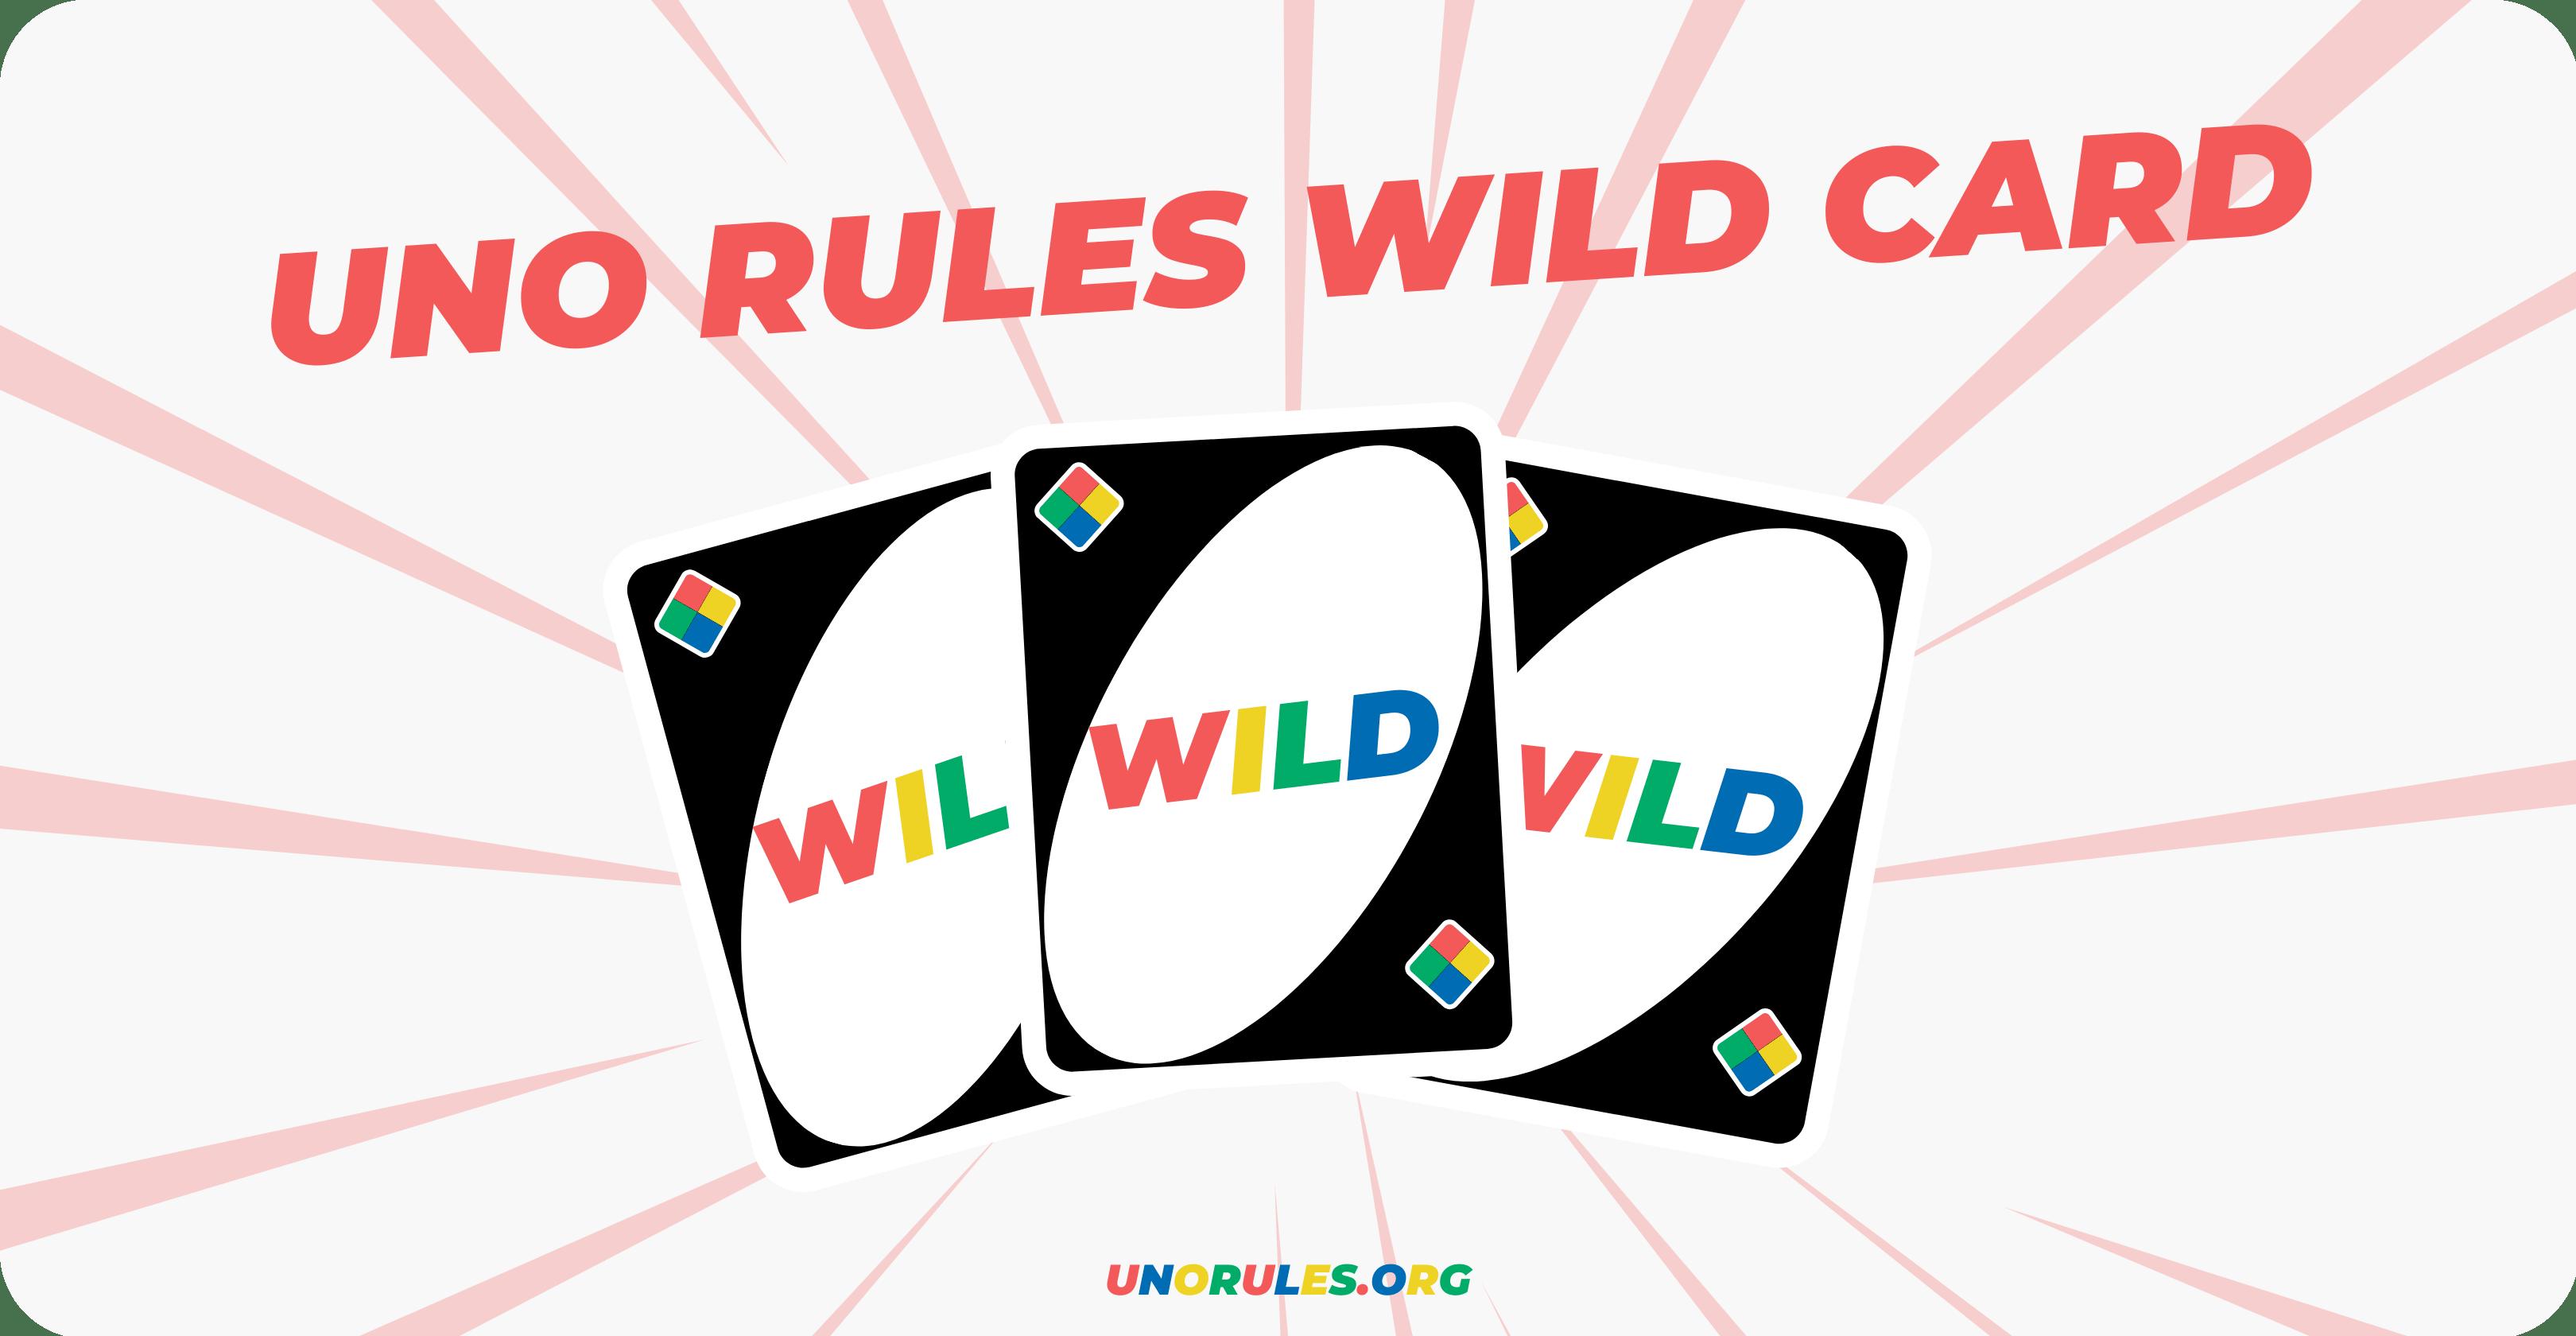 Uno rules wild card